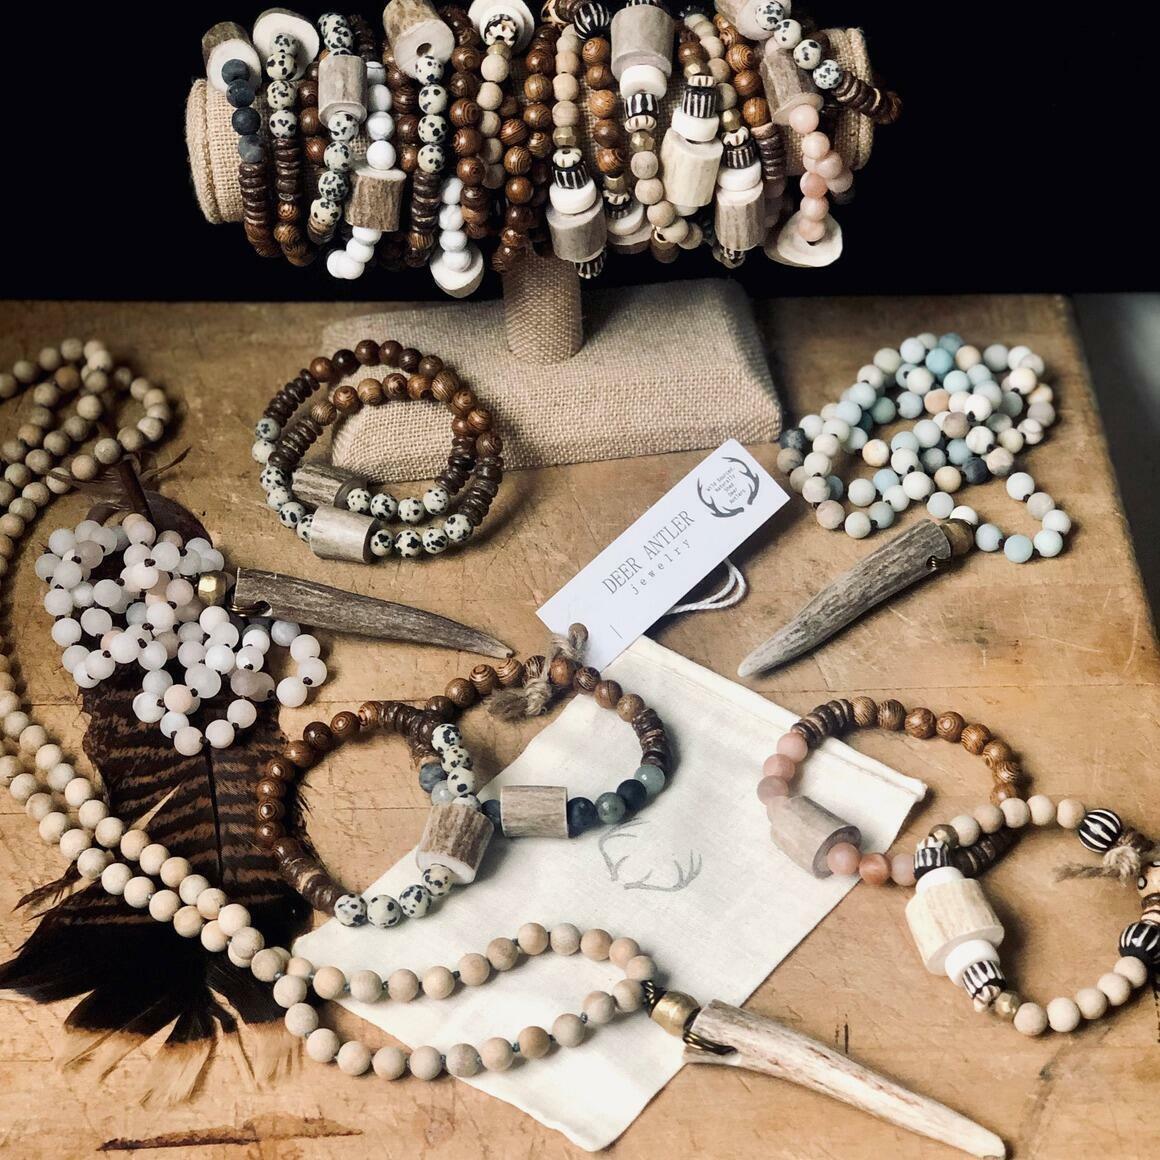 Deer Antler Bead and Gemstone Bracelet   Trada Marketplace